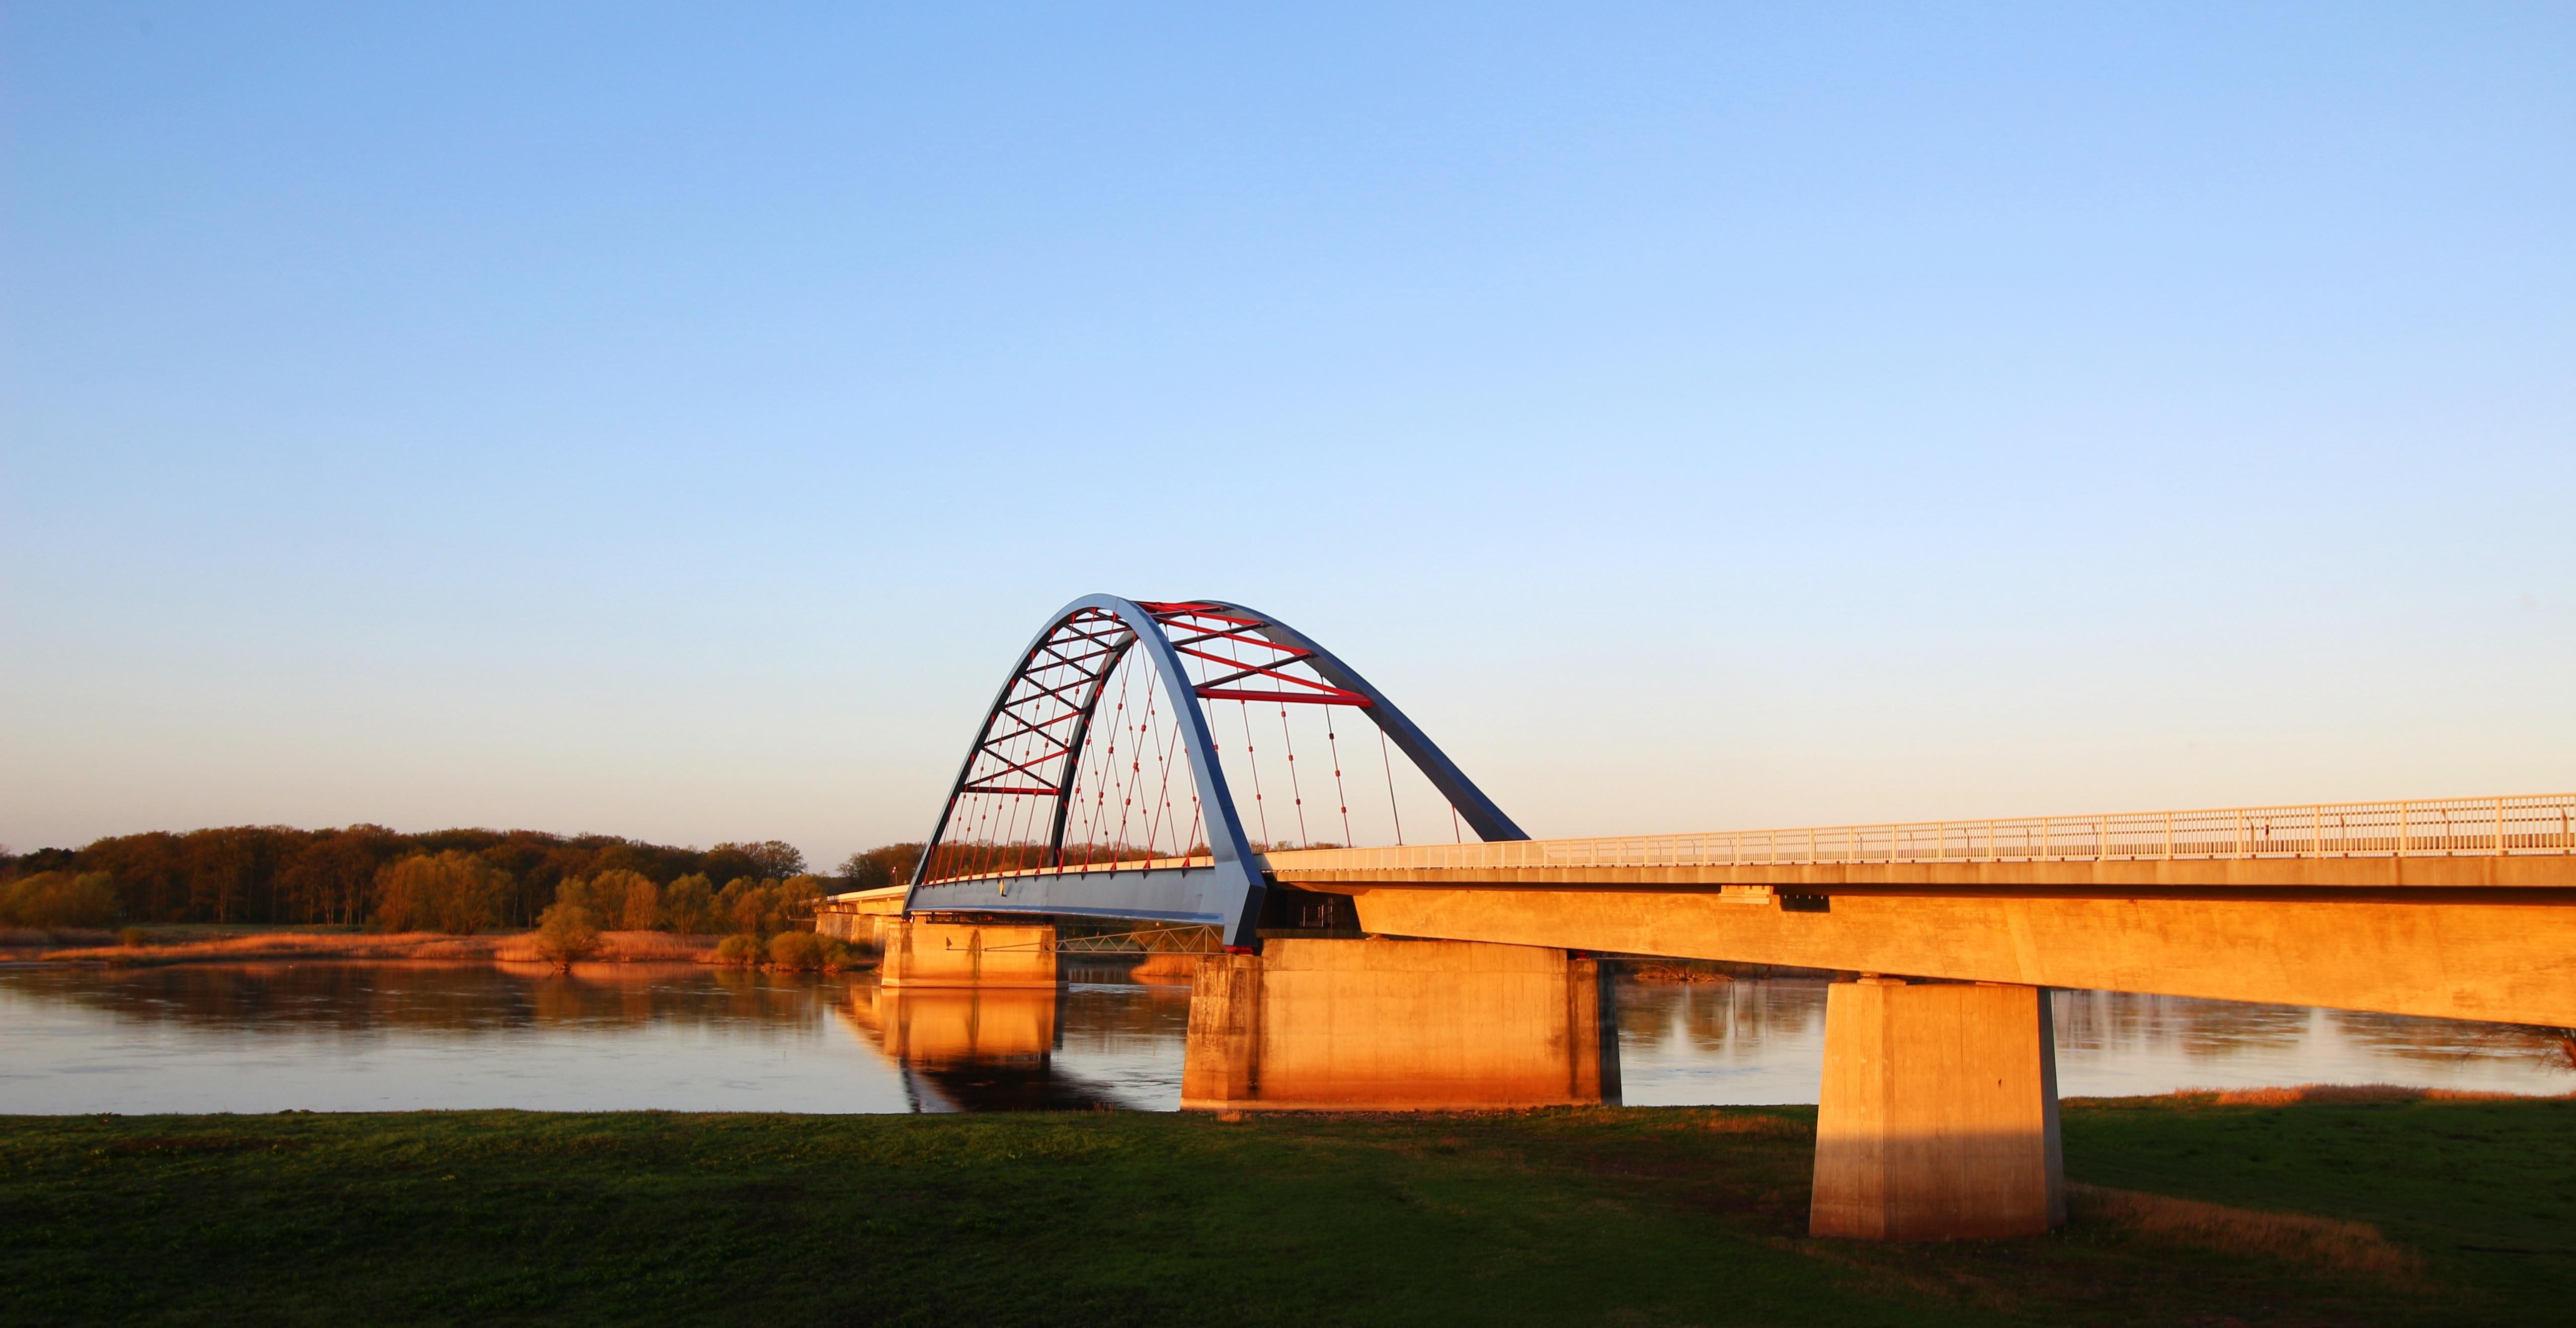 Fotos gratis : arquitectura, edificio, río, reflexión, depósito ...